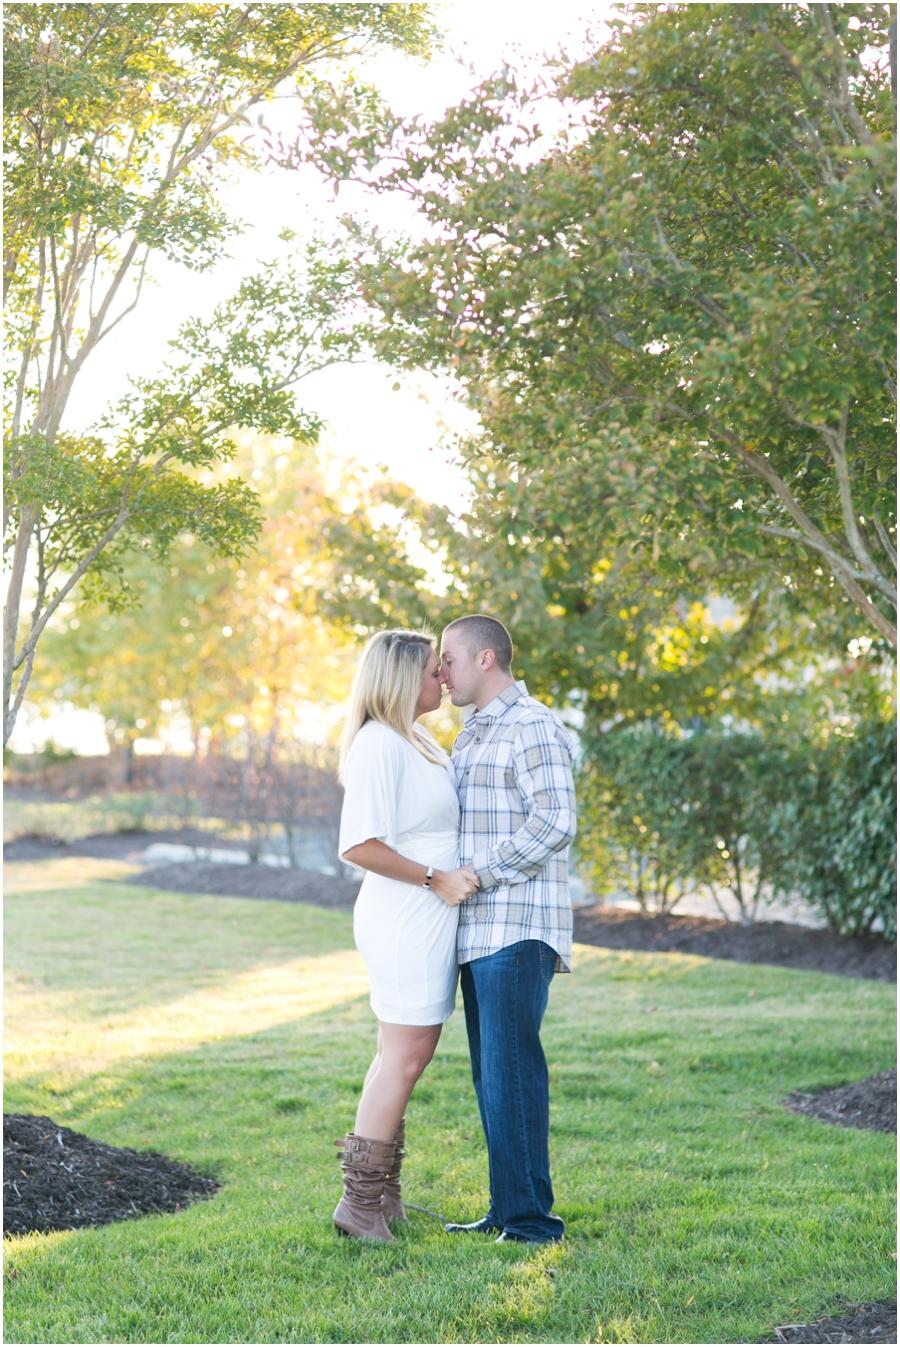 Broomes Island Engagement Session - Hyatt Regency Chesapeake Bay Couple